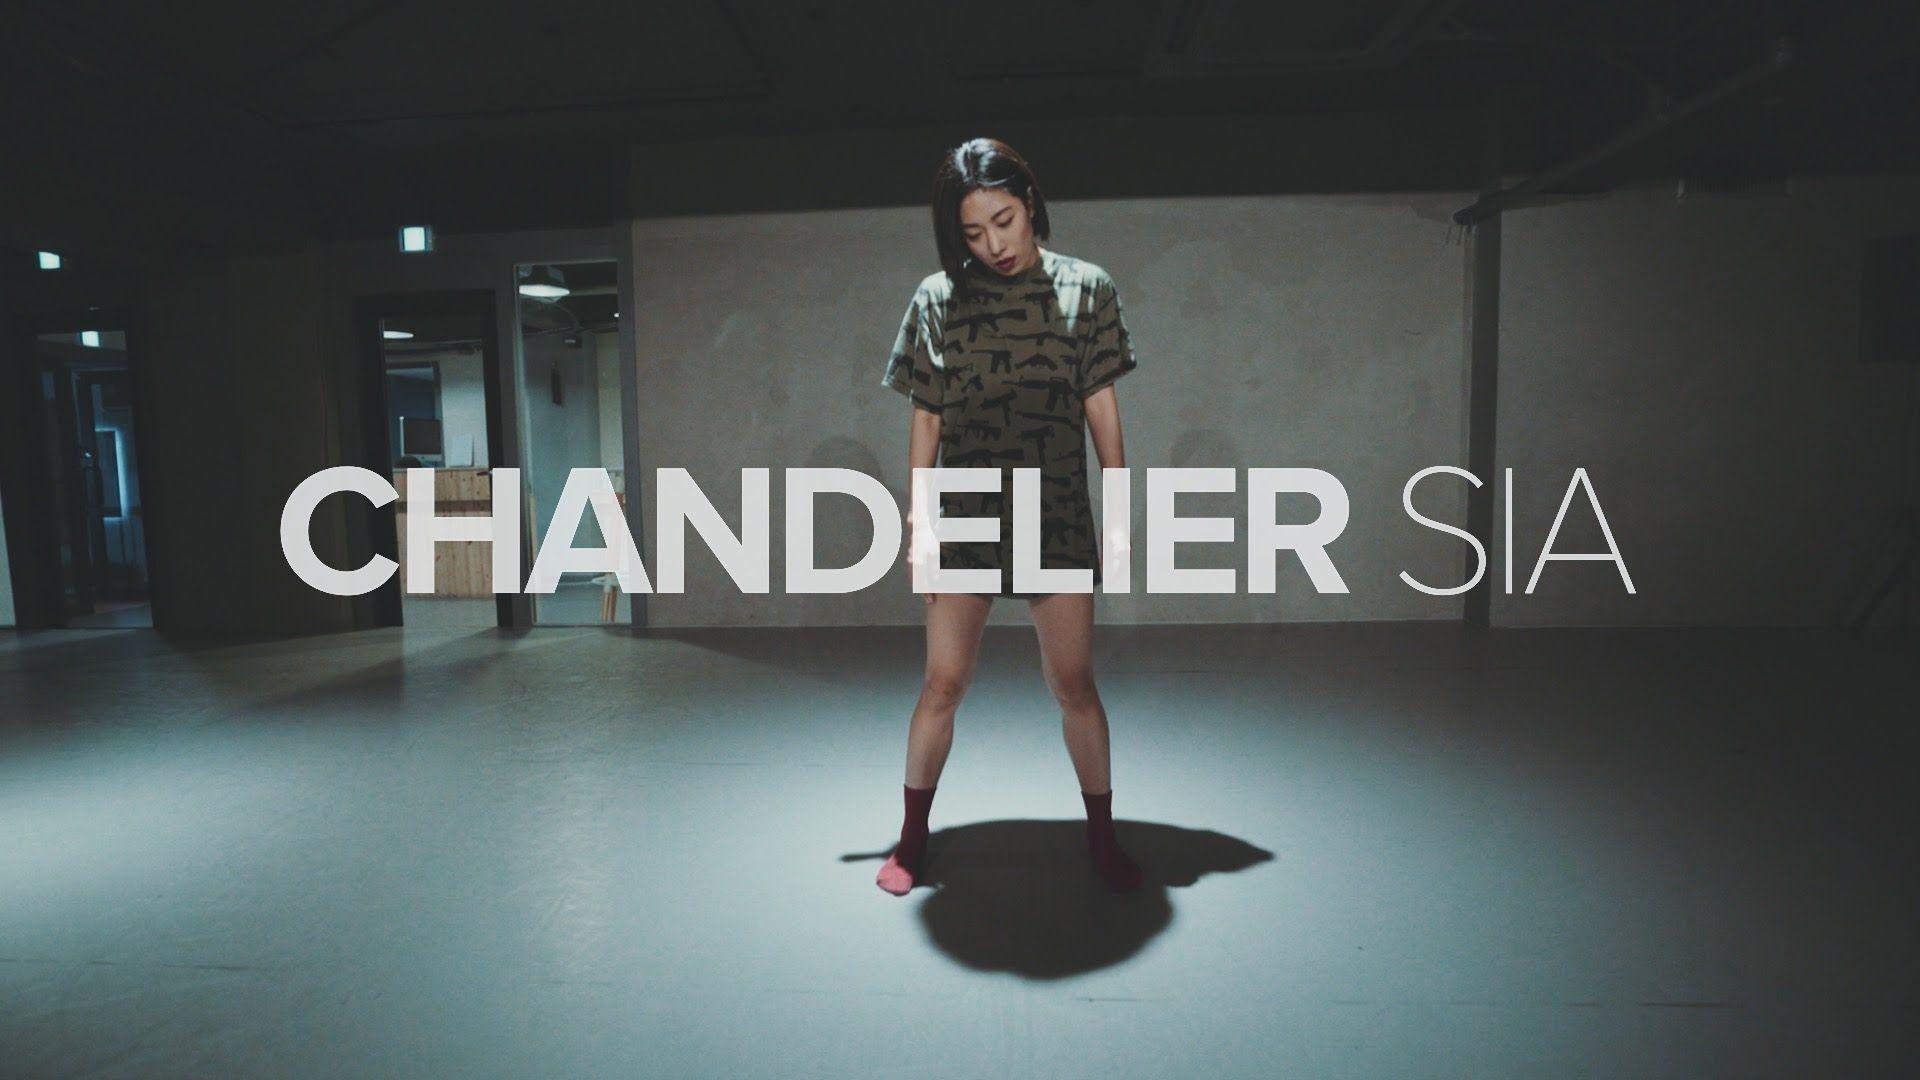 Chandelier sia lia kim choreography dance pinterest dancing chandelier sia lia kim choreography arubaitofo Image collections